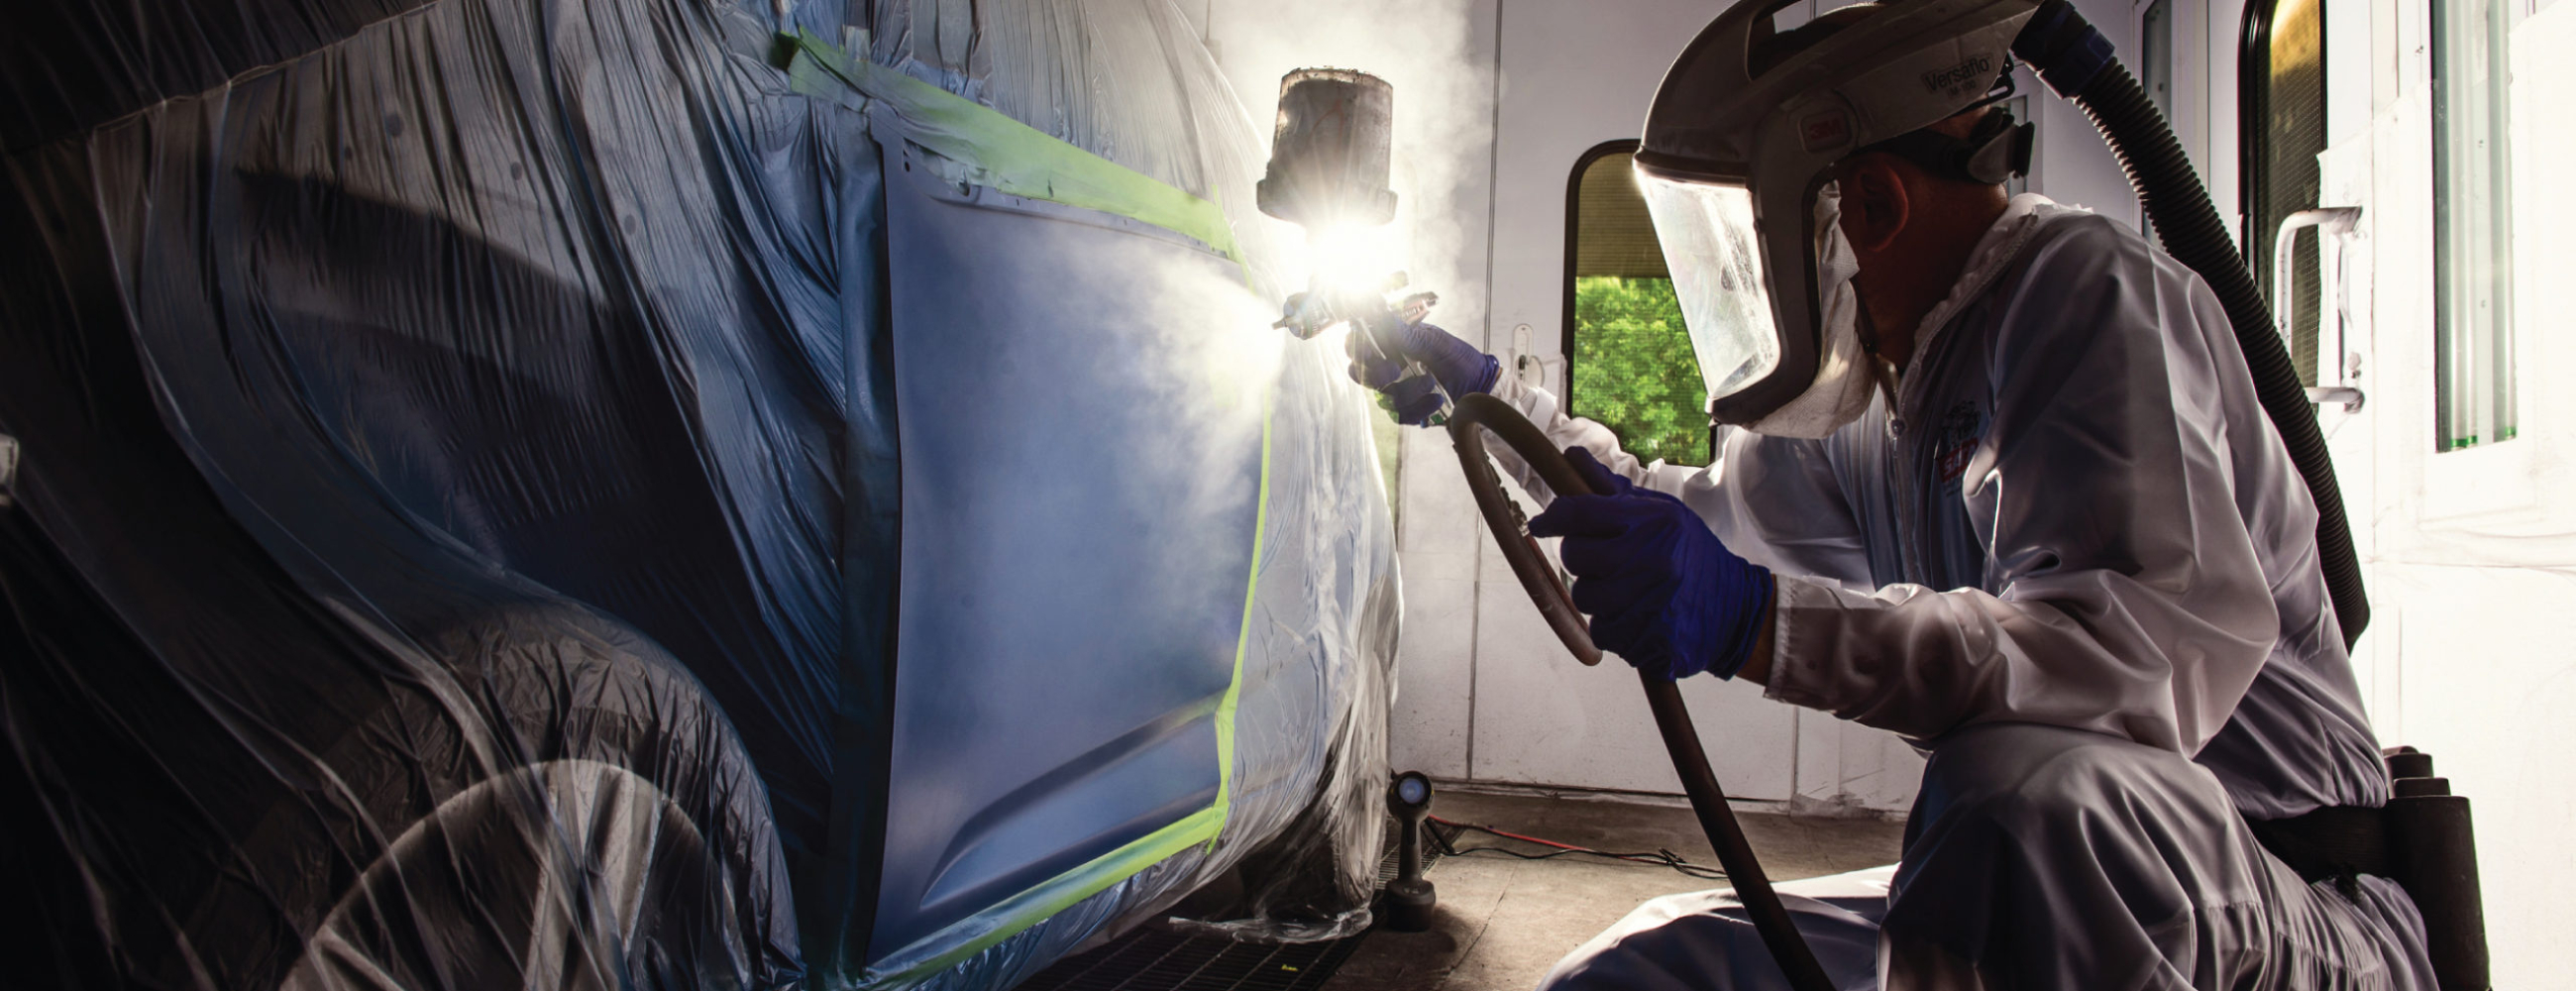 Painter using Accudraft TITAN Downdraft Paint Booth